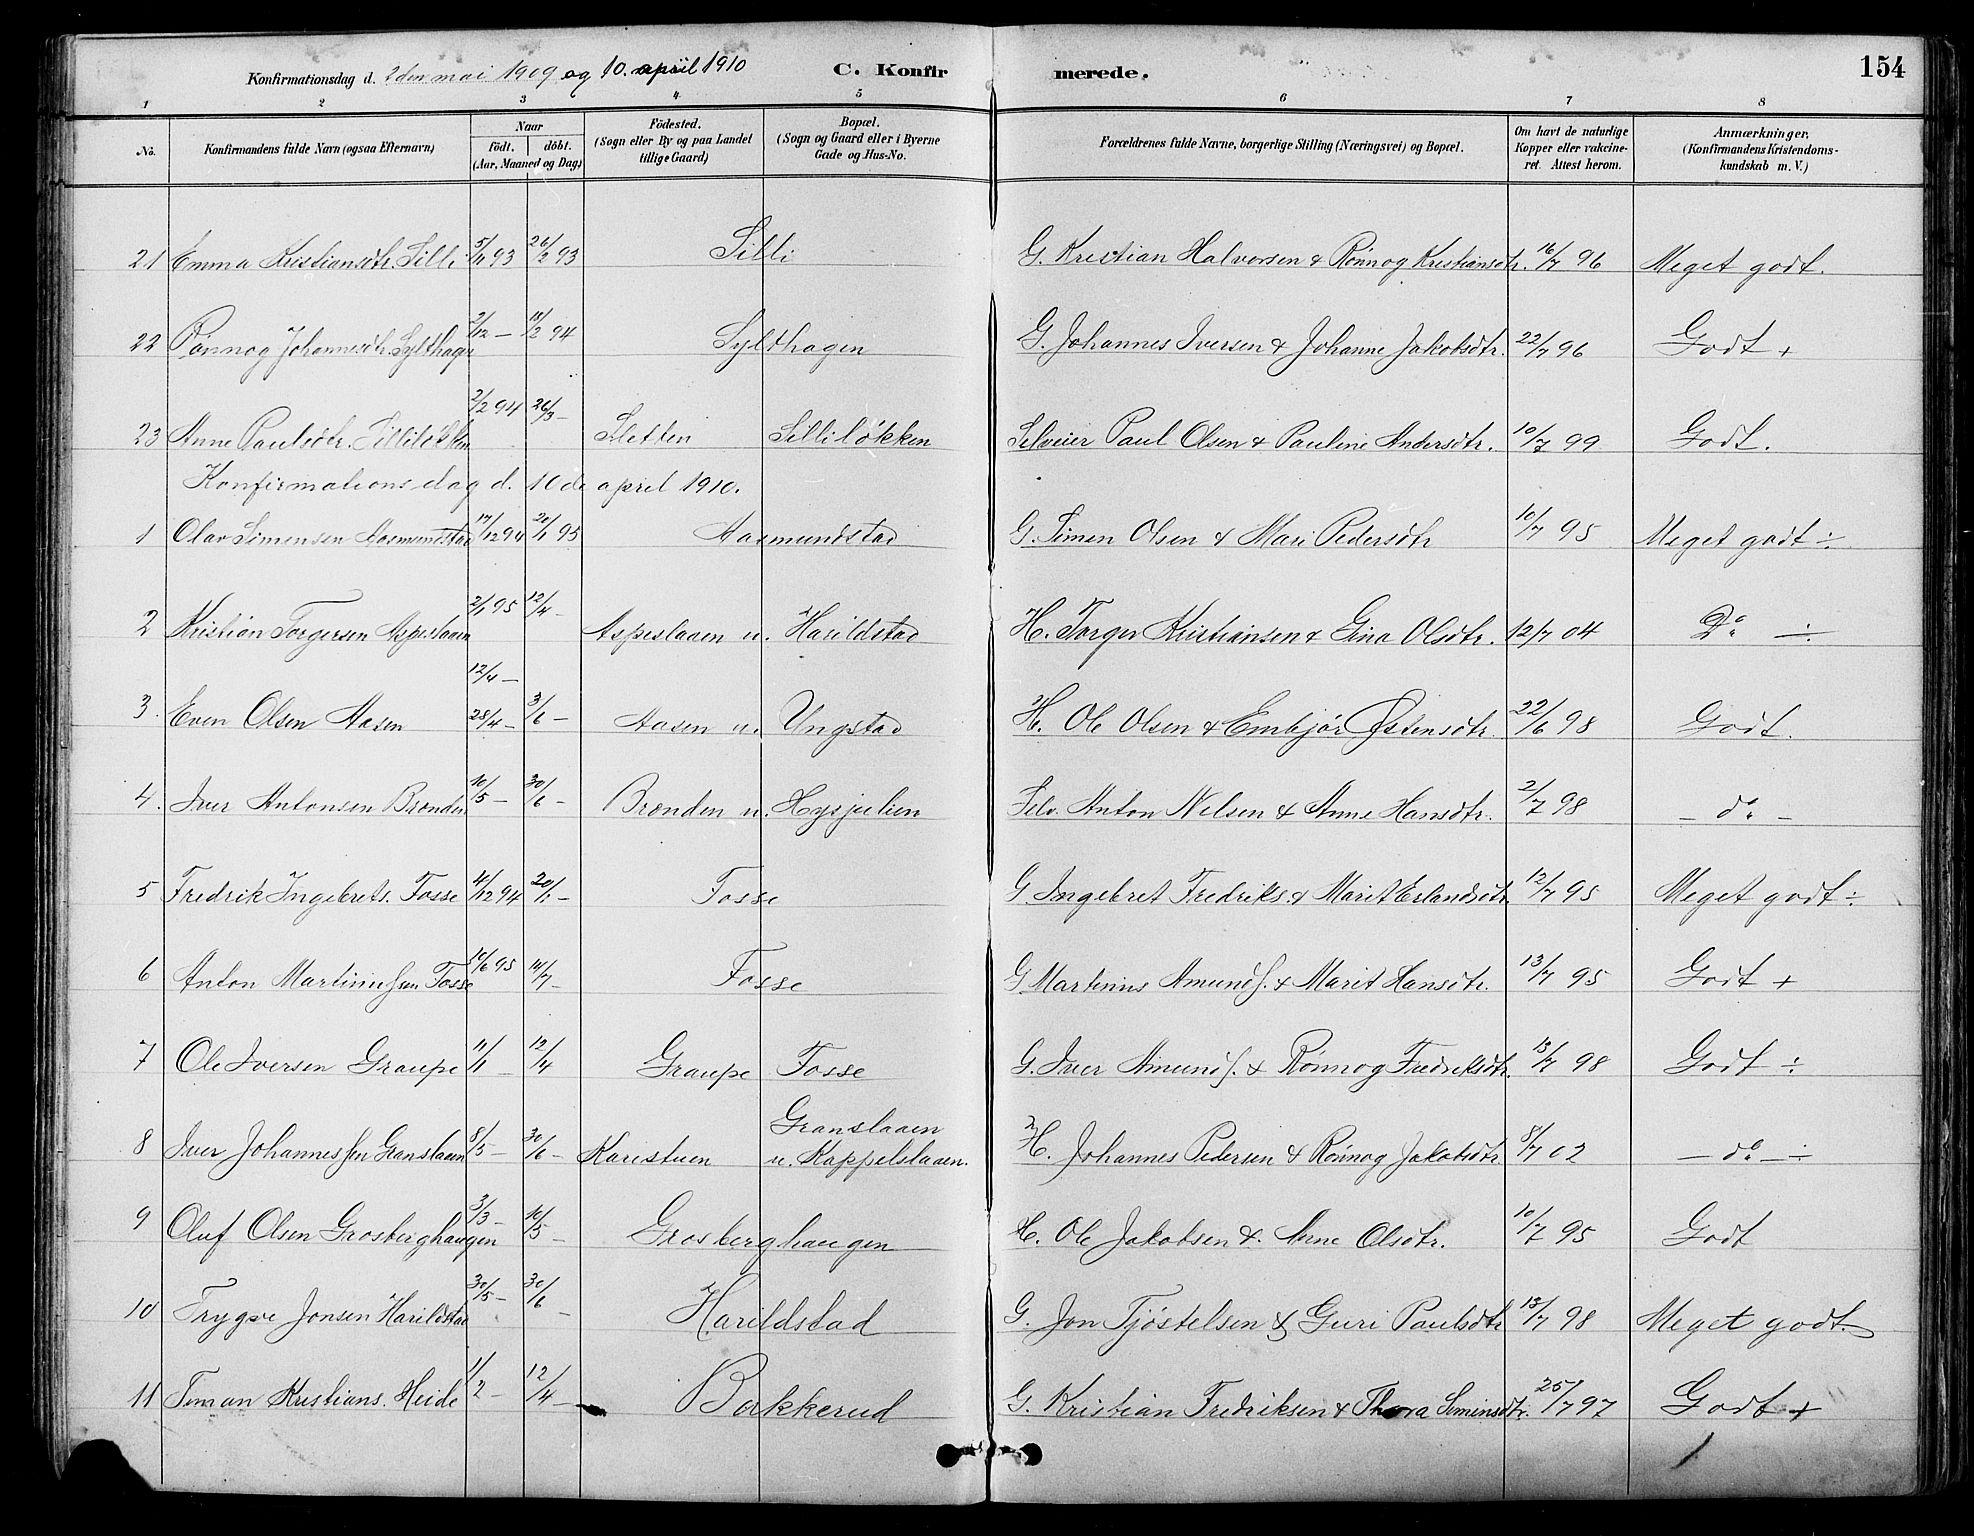 SAH, Nord-Fron prestekontor, Klokkerbok nr. 5, 1884-1914, s. 154